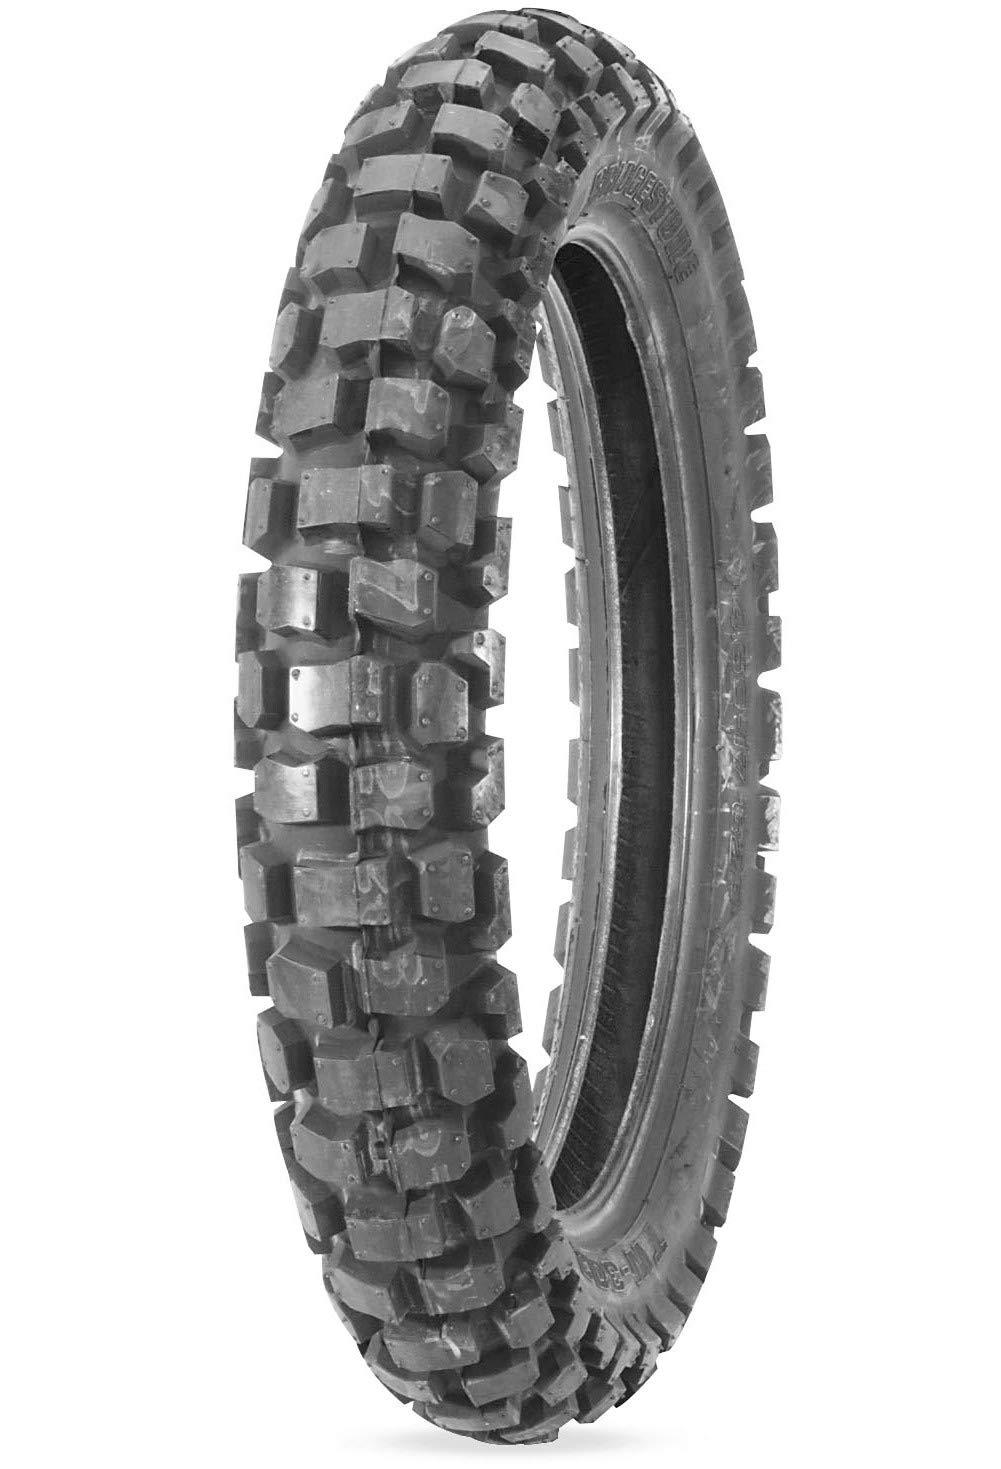 Bridgestone Trail Wing TW302 Dual/Enduro Rear Motorcycle Tire 4.60-18 -Parent tr-300678